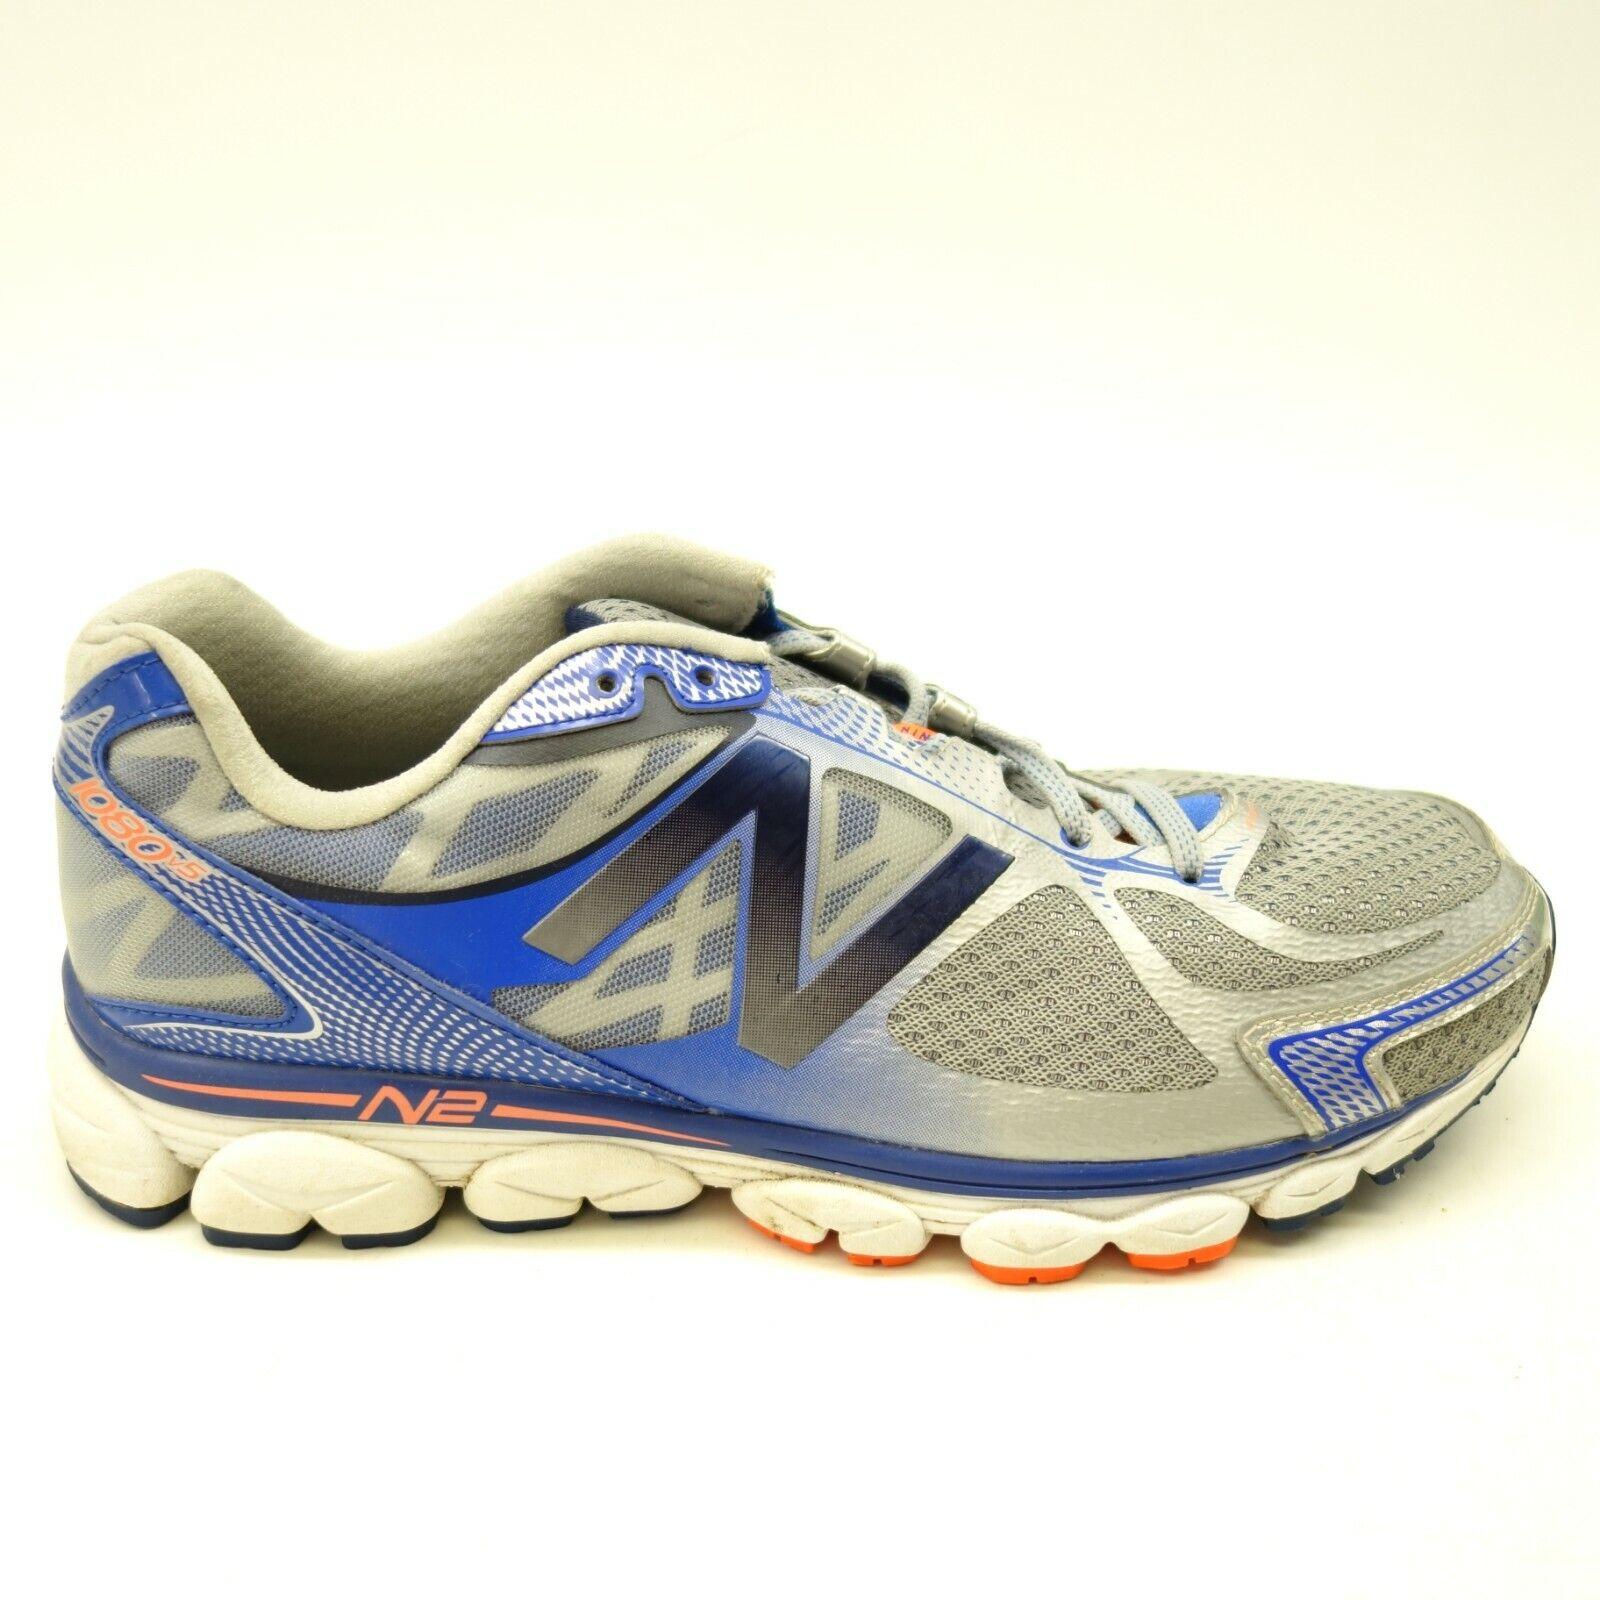 New Balance Mens 1080v5 US 10.5 EU 44.5 4E WIDE Cush Trail Runner Athletic scarpe